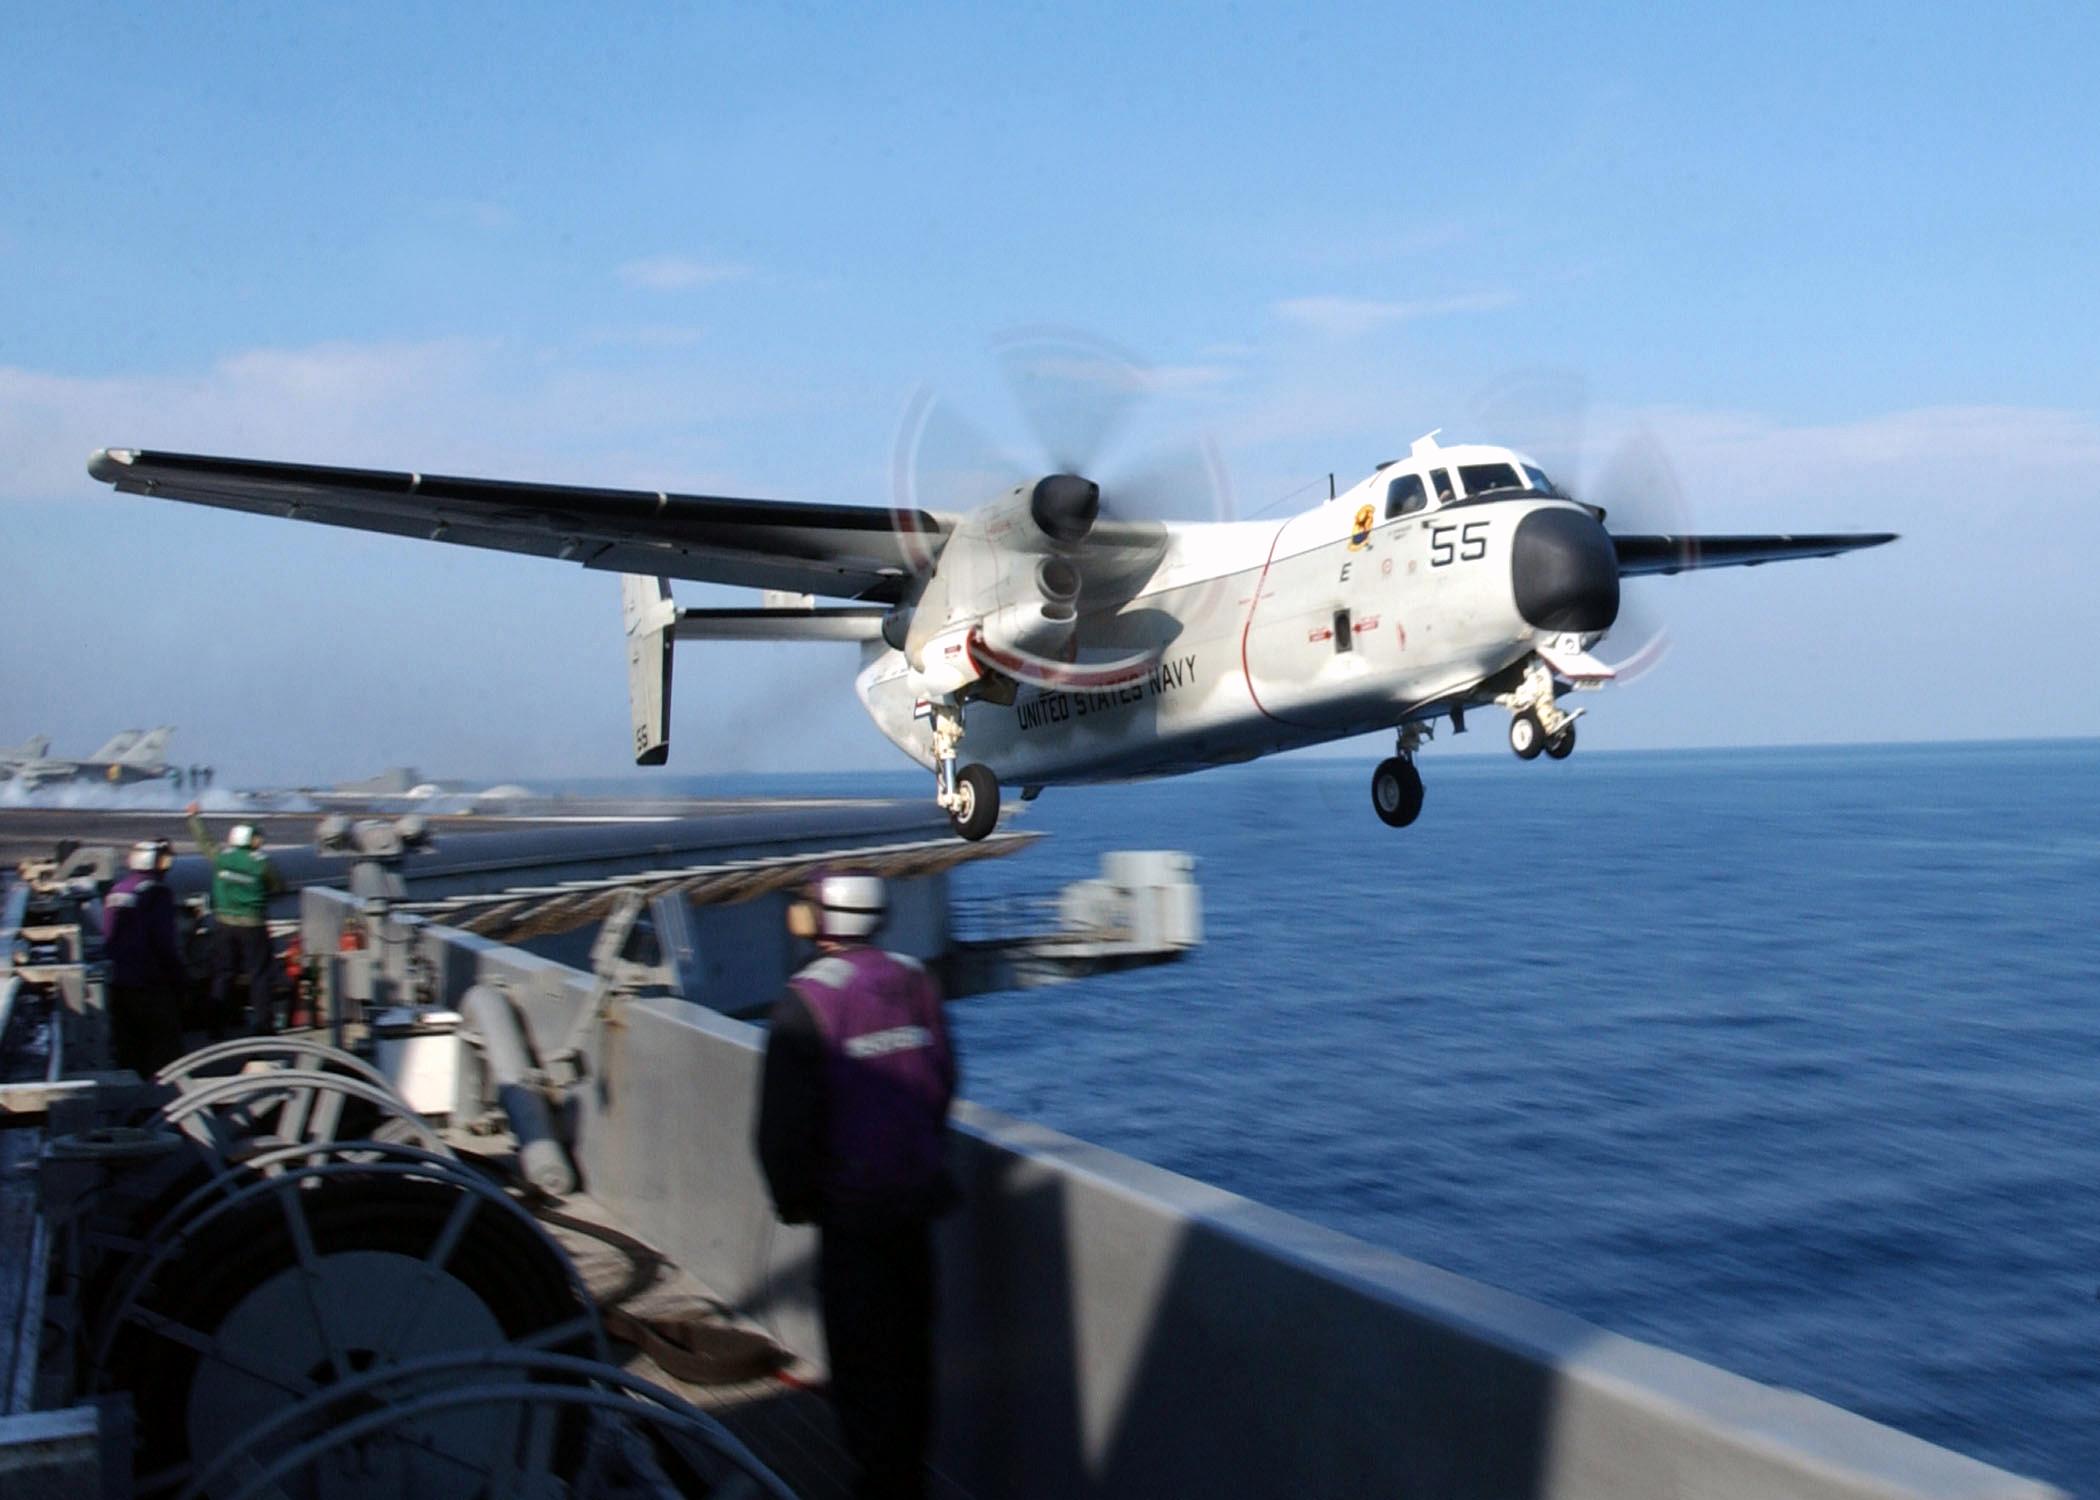 US_Navy_030214-N-6895M-504_C-2_Greyhound_launches_from_CV_71.jpg